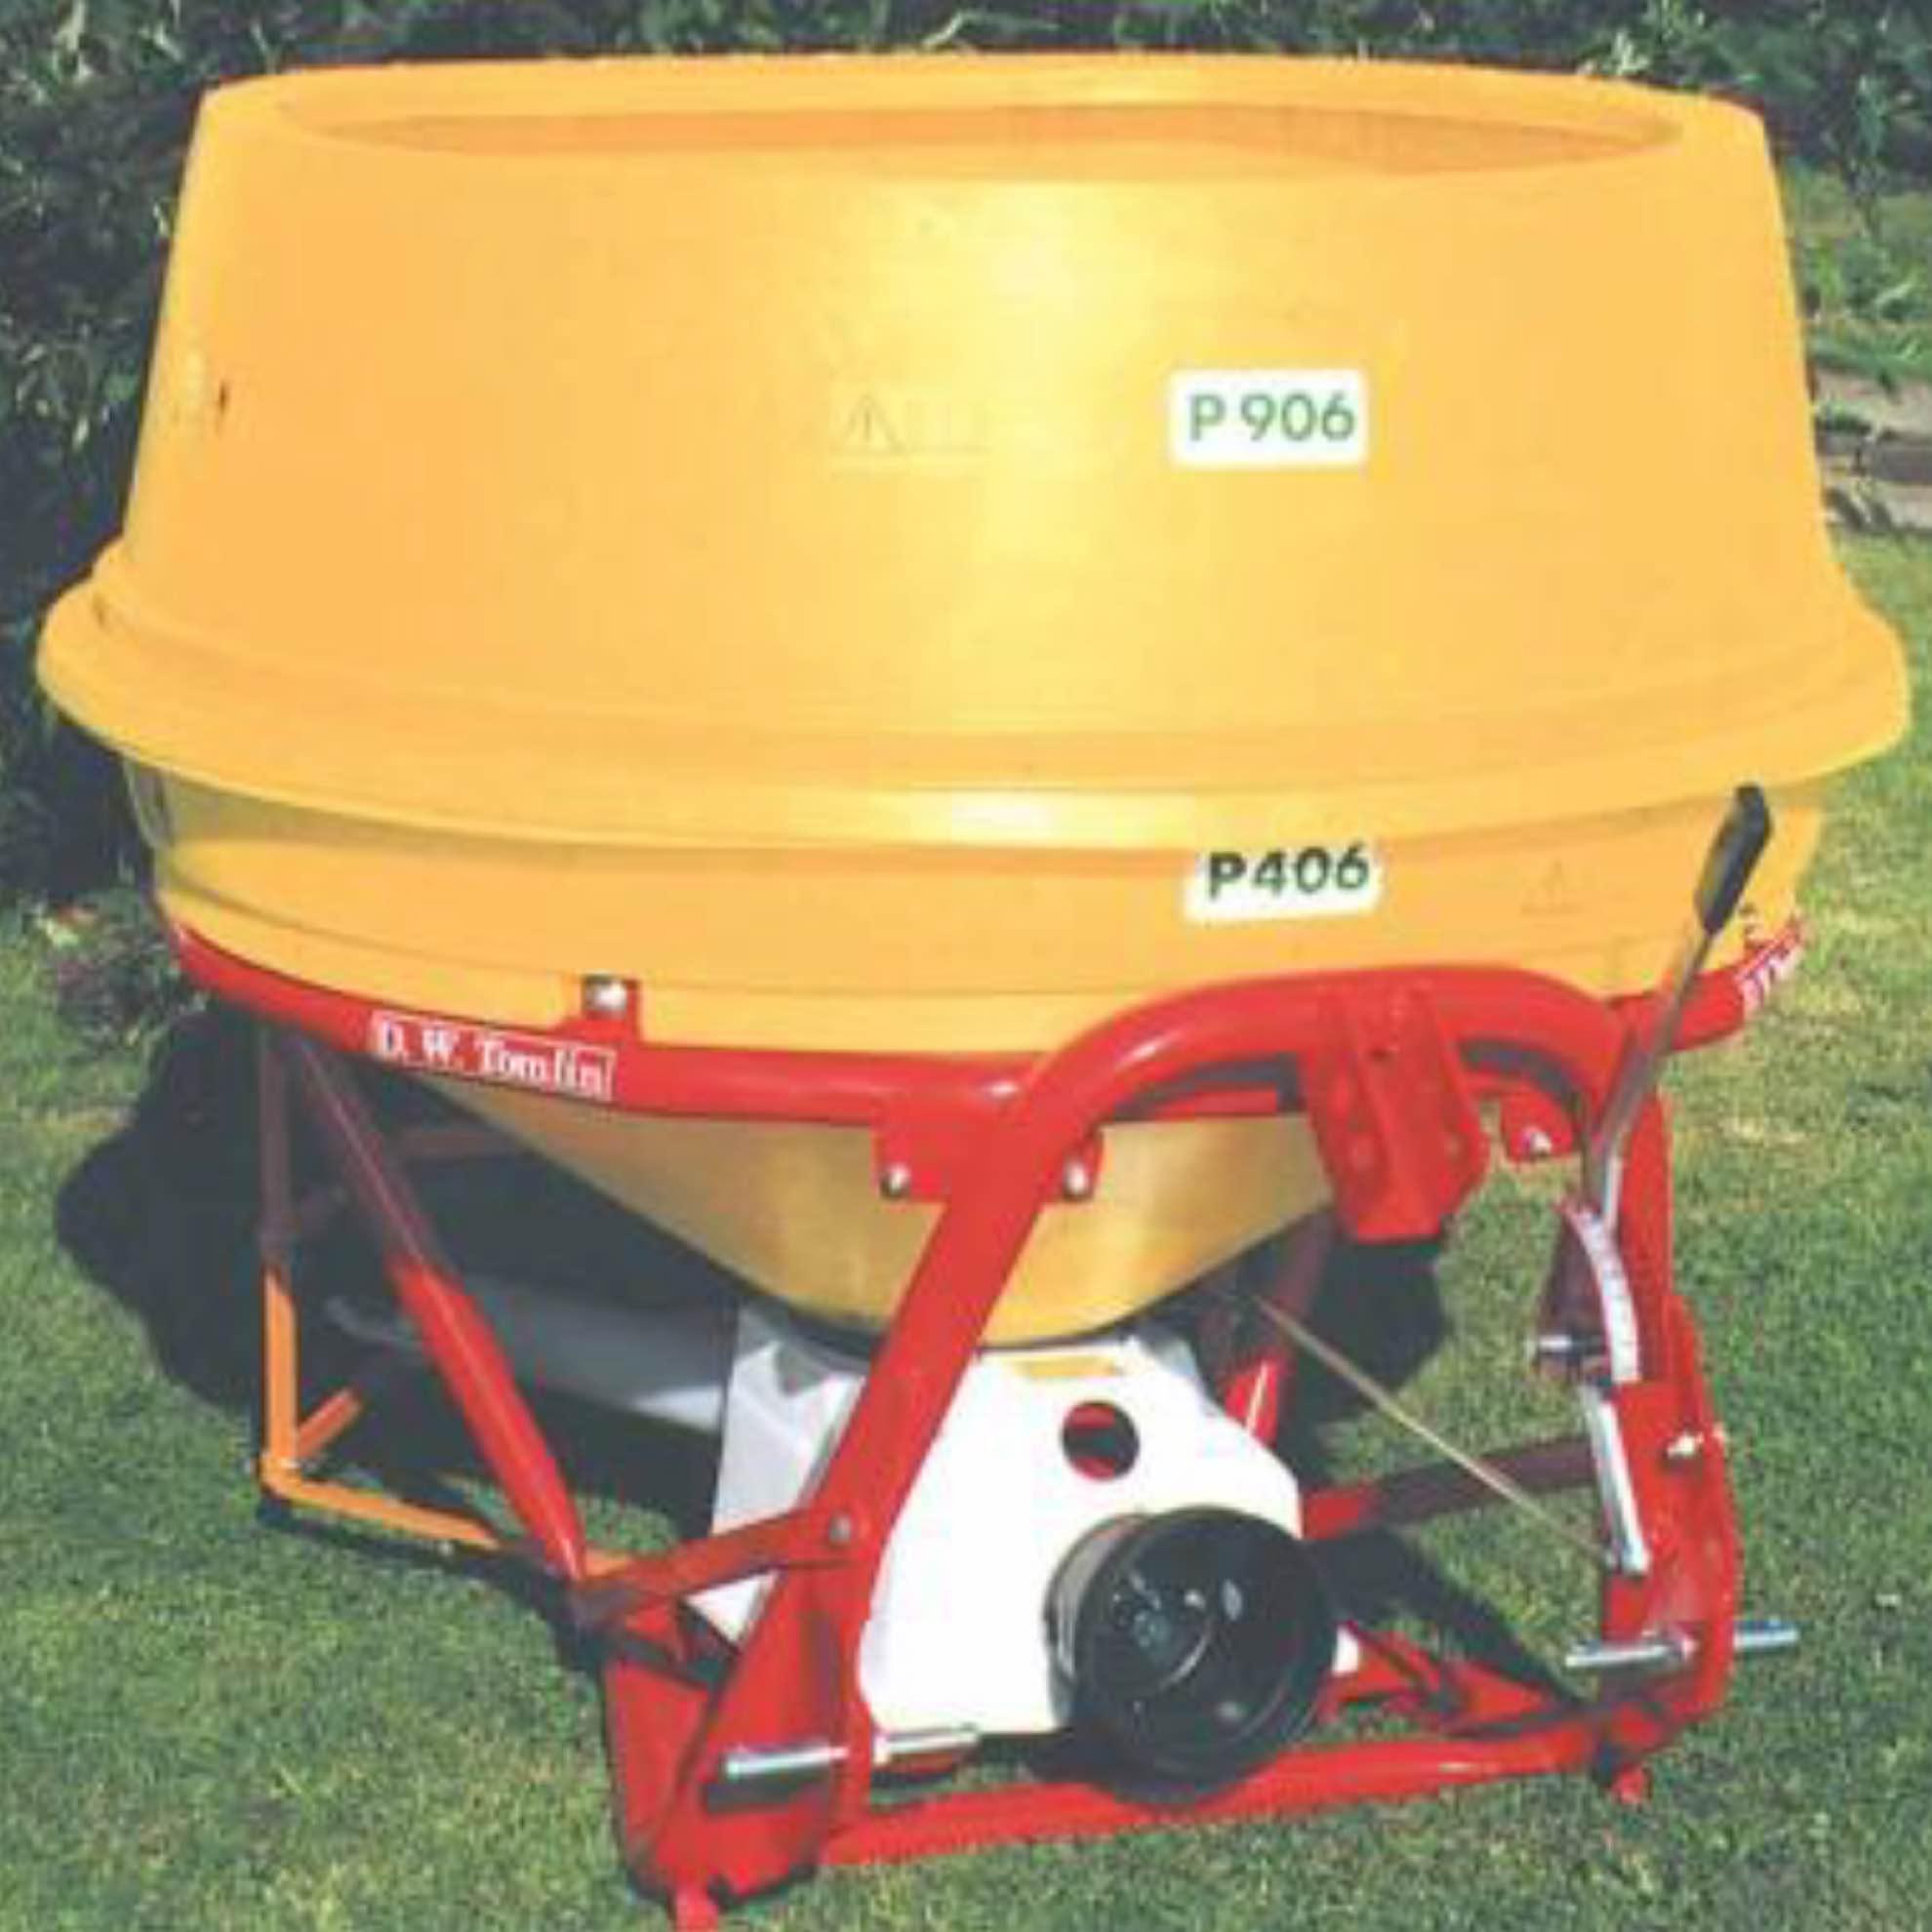 D.W. Tomlin PL500 Fertiliser Spreader with Tractor Mounted Disc